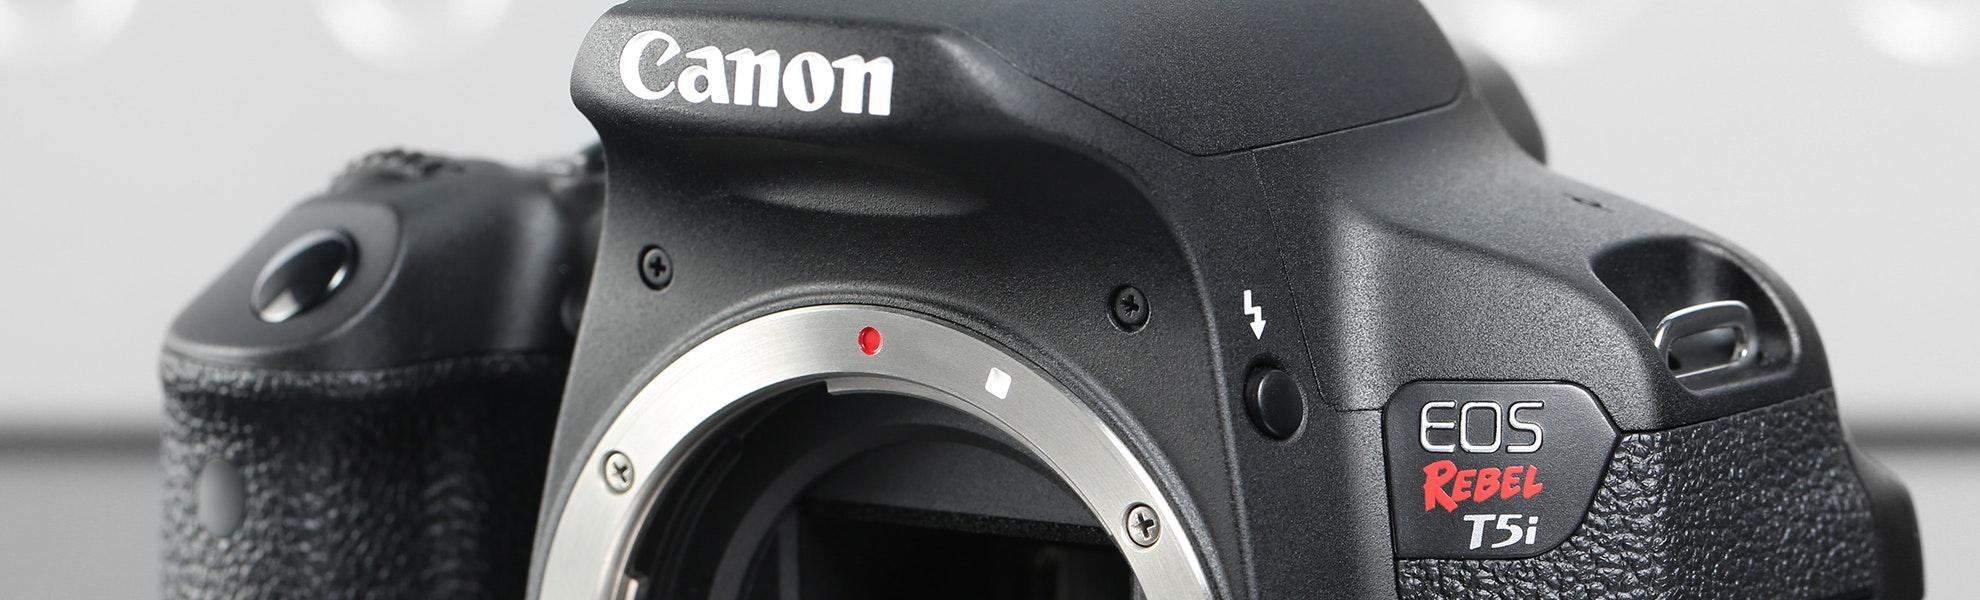 Canon Rebel T5i DSLR w/18-55mm Kit